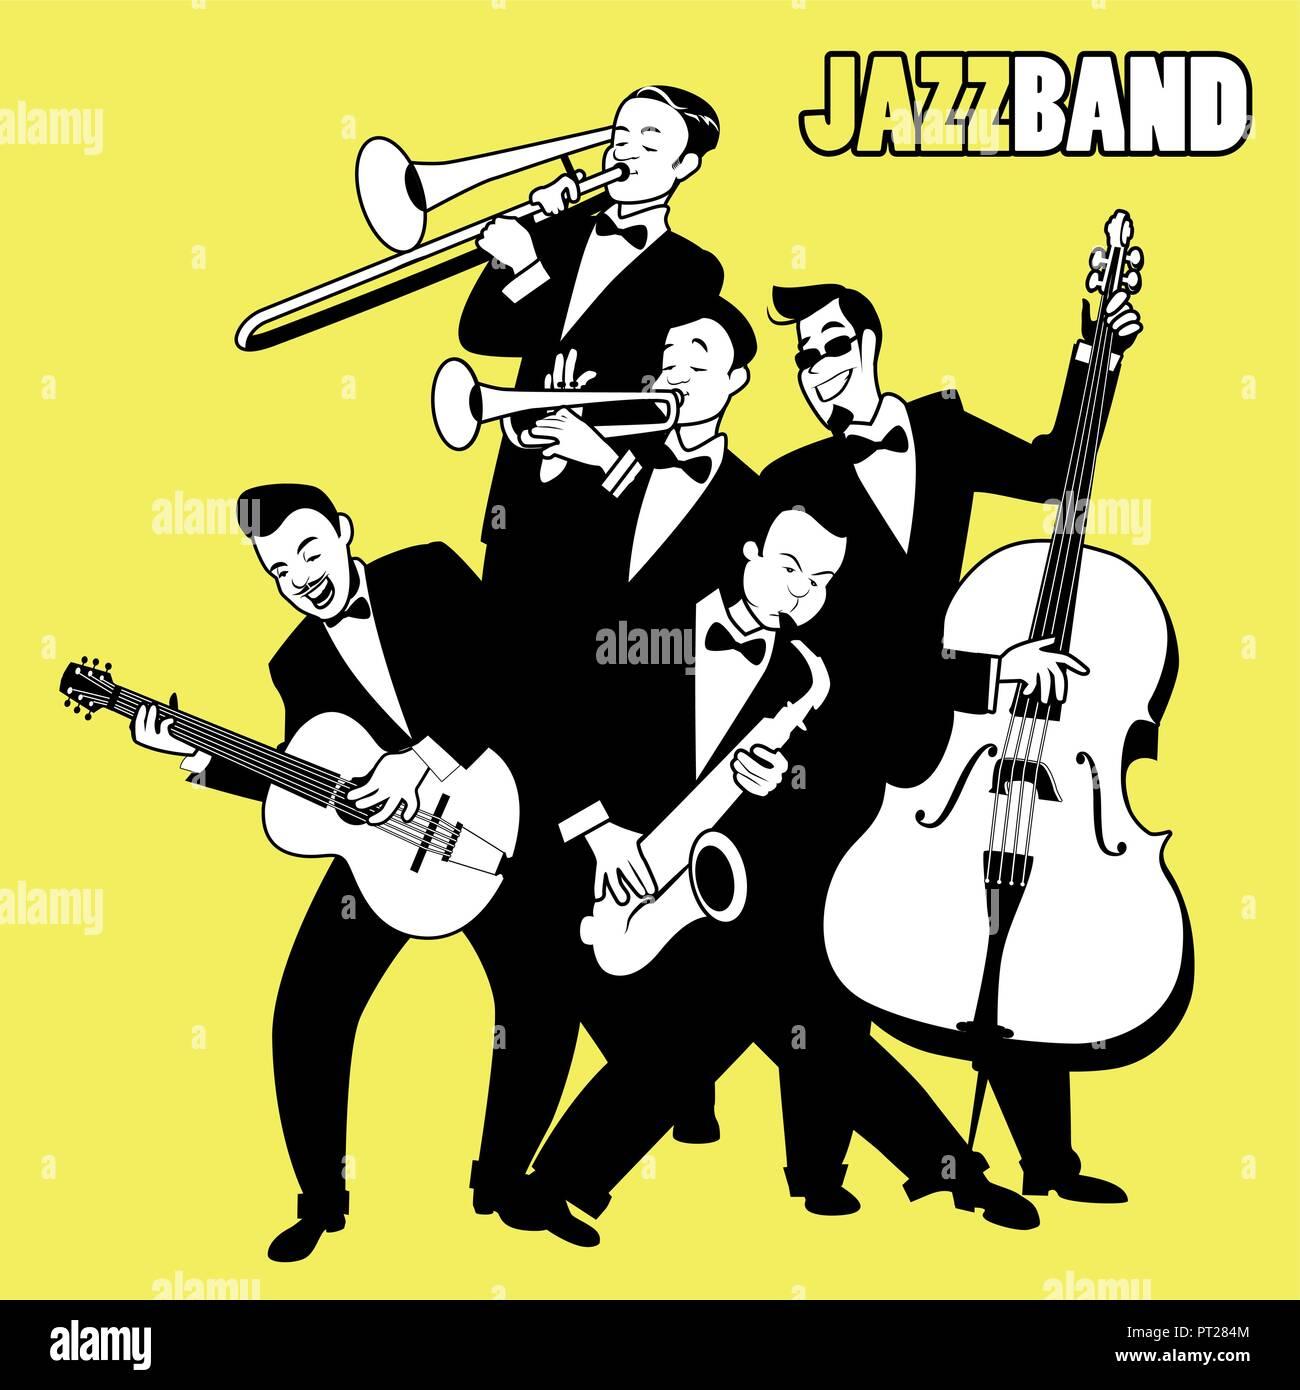 Jazz Band. Five jazz players playing jazz music. Cartoon Style - Stock Image